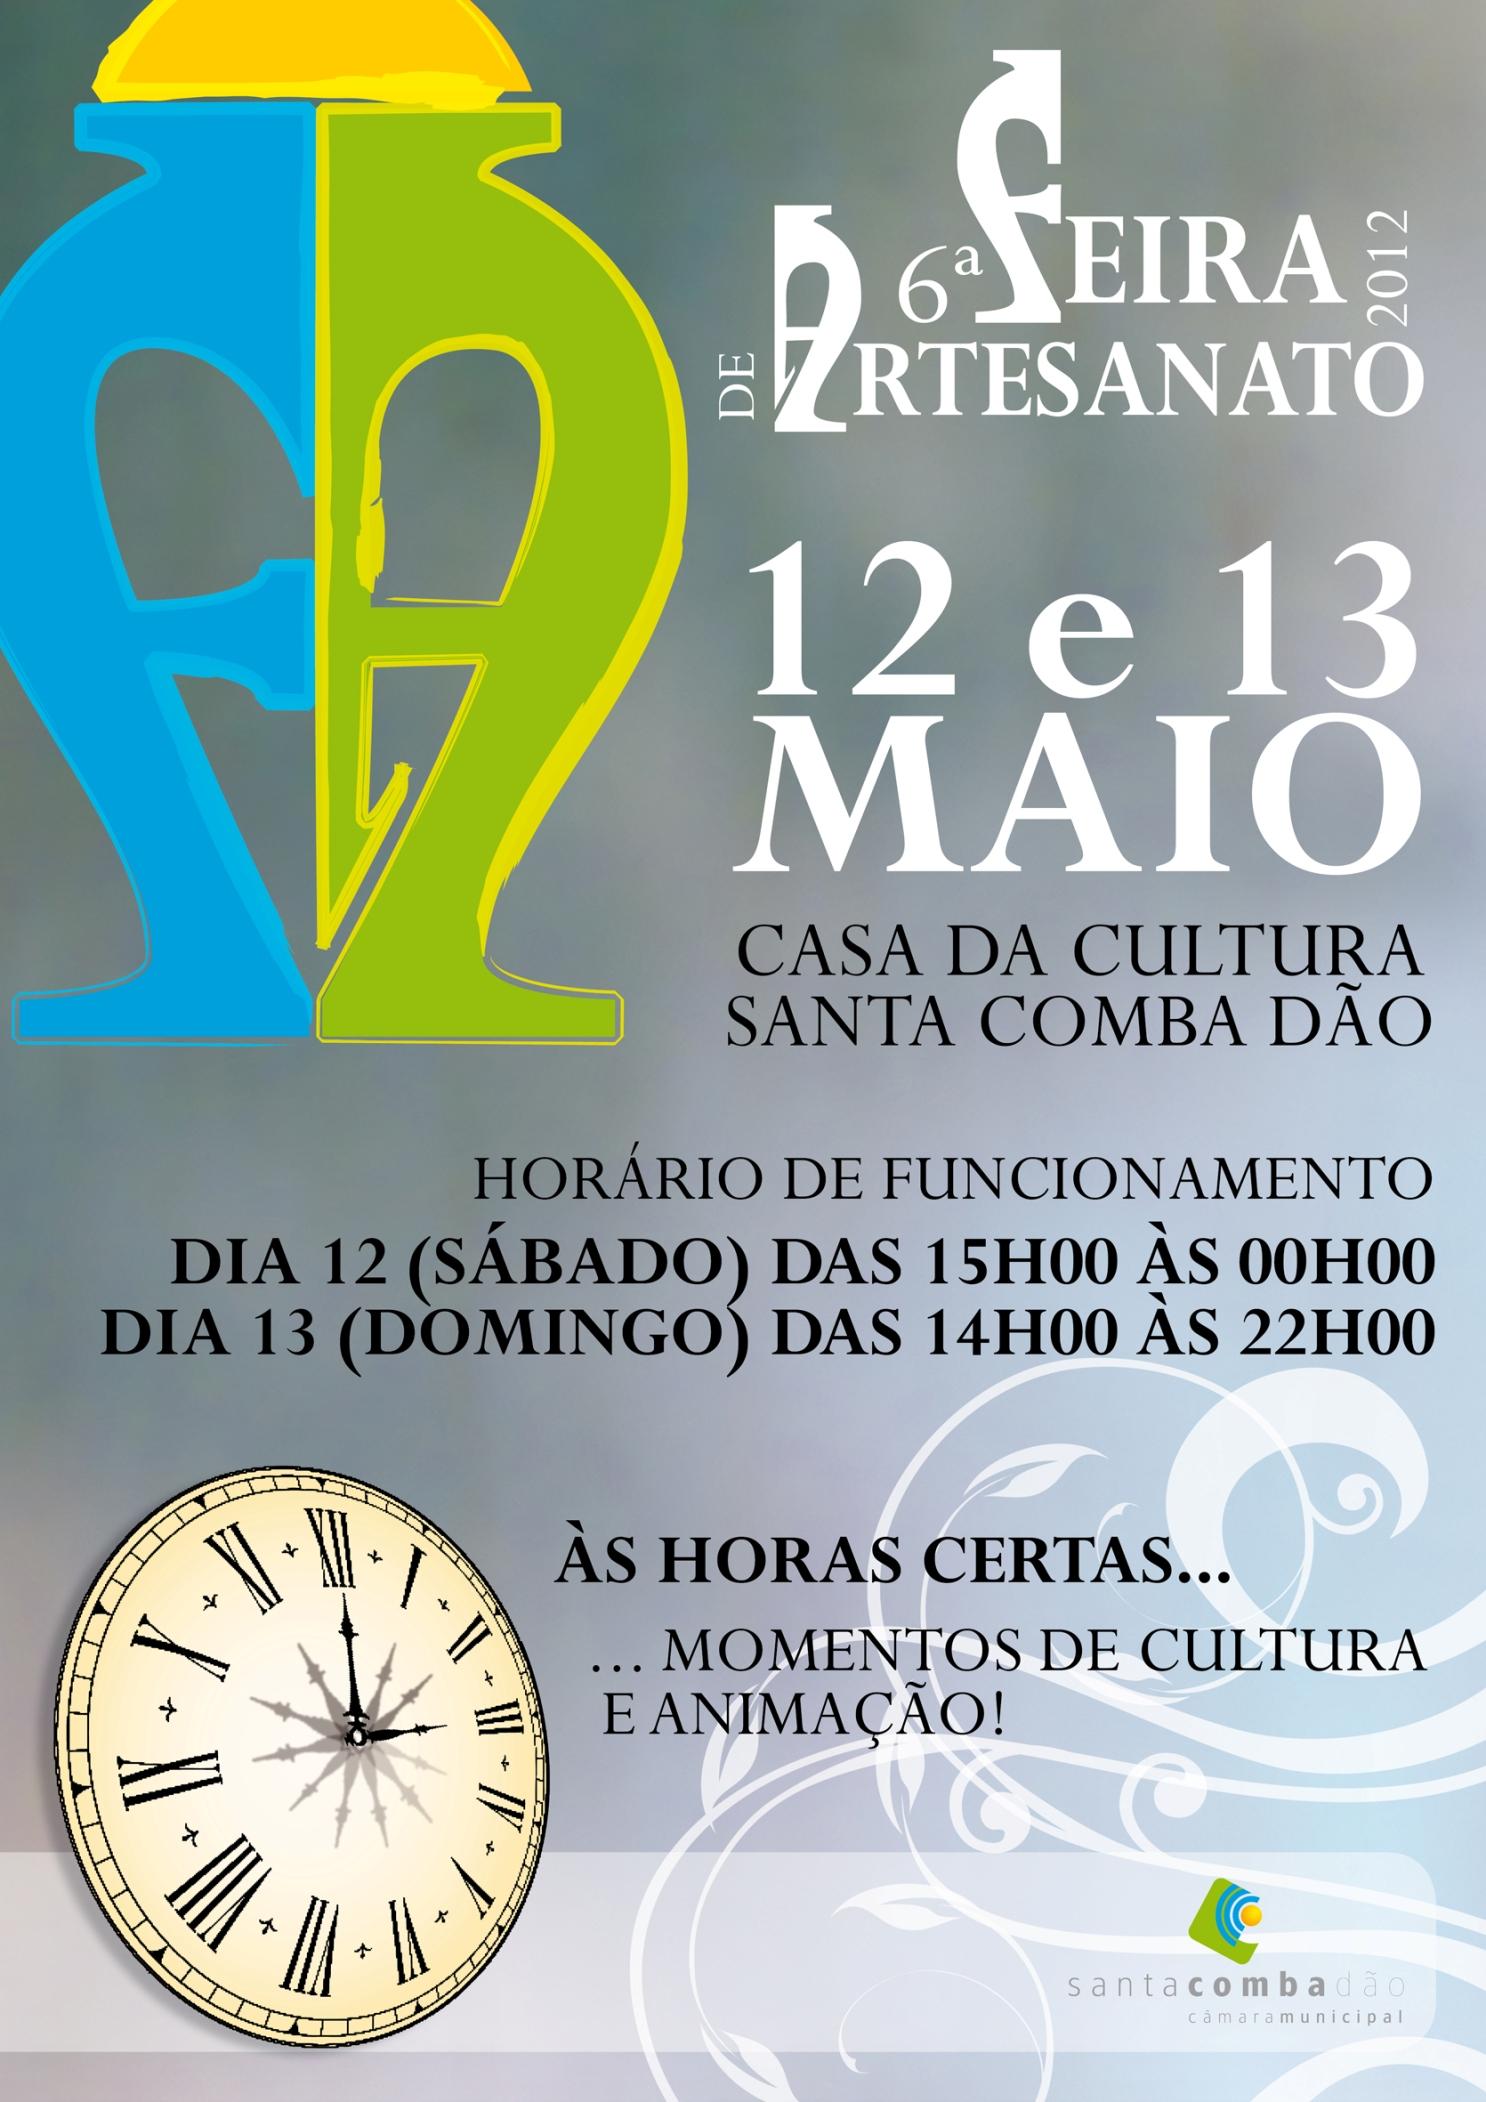 feira_artesanato_santa_comba_2012